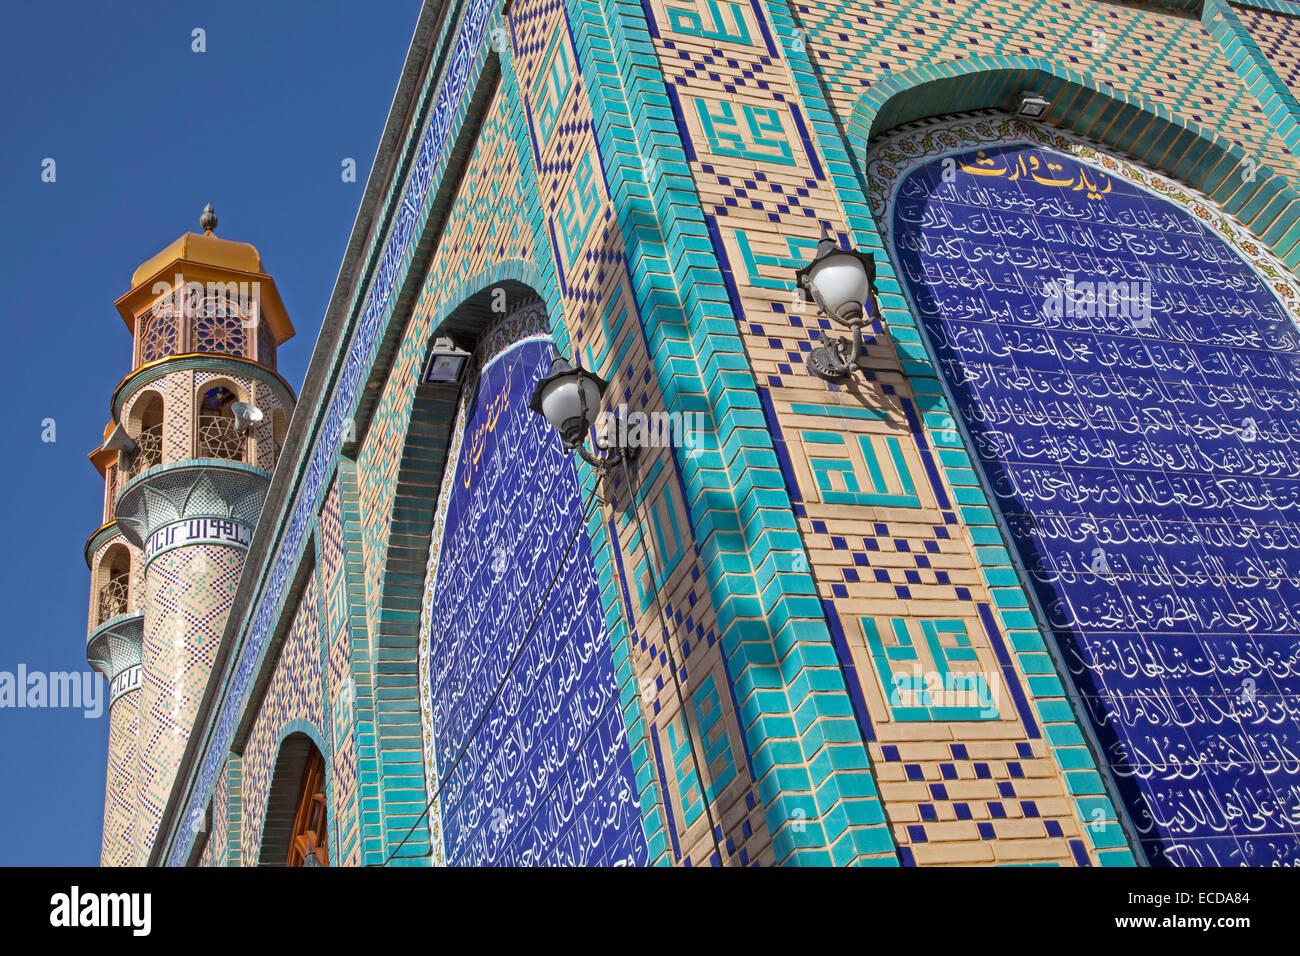 The Sheikh Safi al-din Khānegāh and Shrine Ensemble, tomb of Sheikh Safi-ad-din Ardabili in Ardabil, Iran - Stock Image